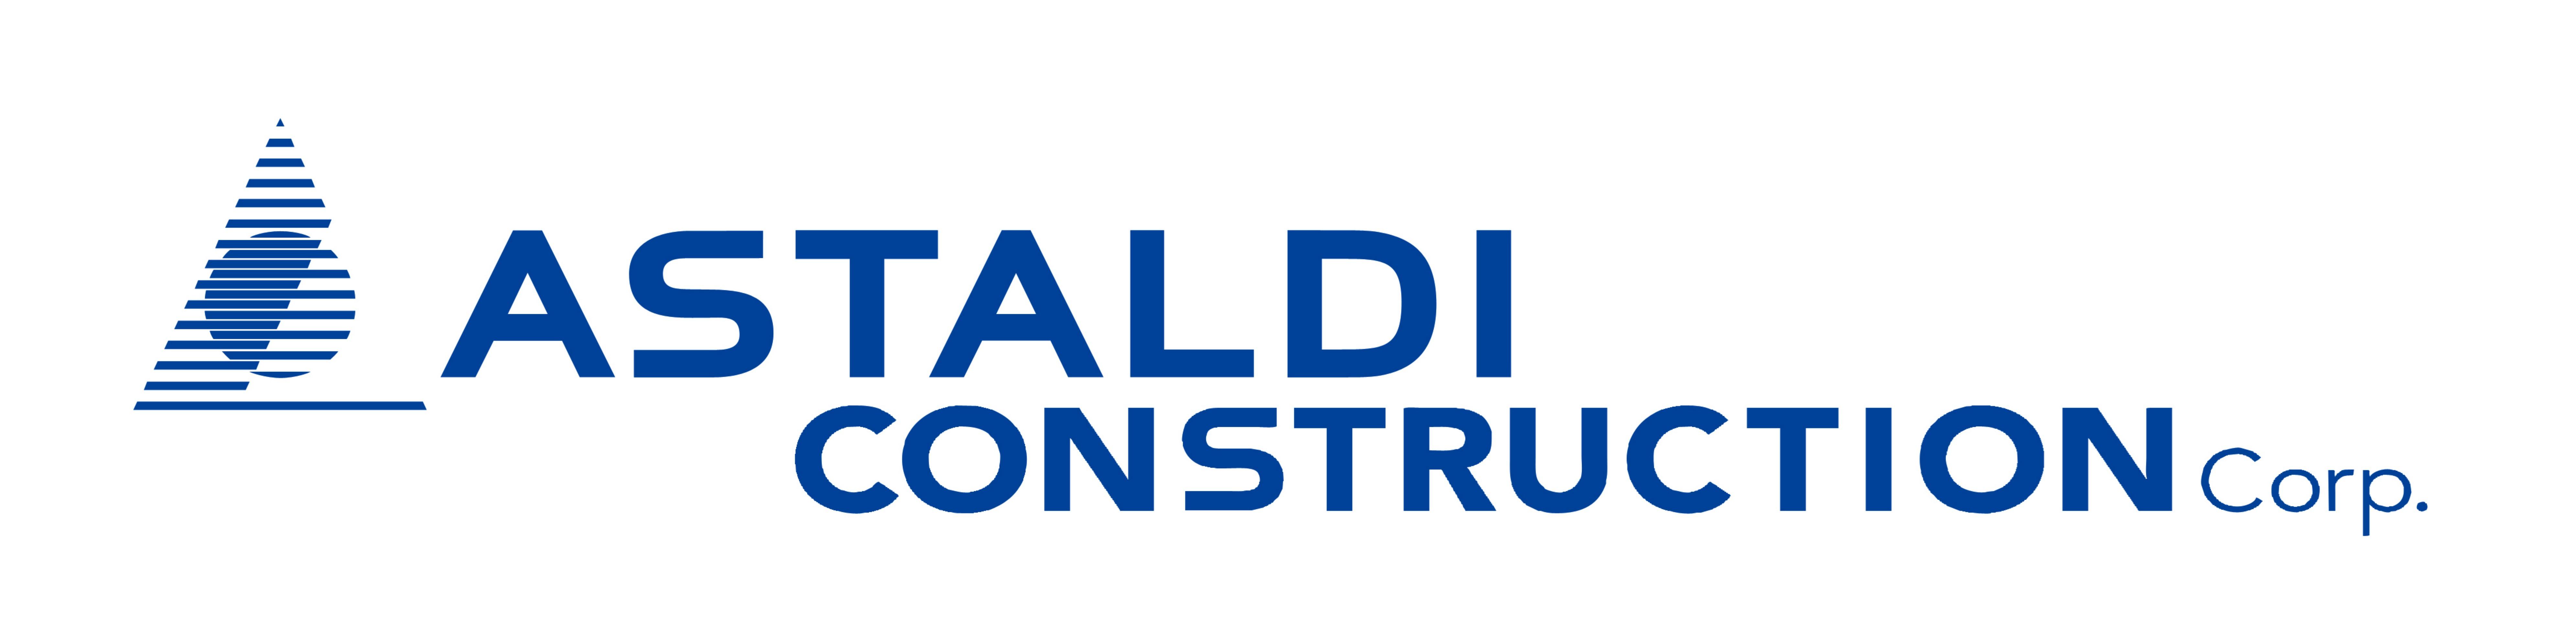 Astaldi Construction